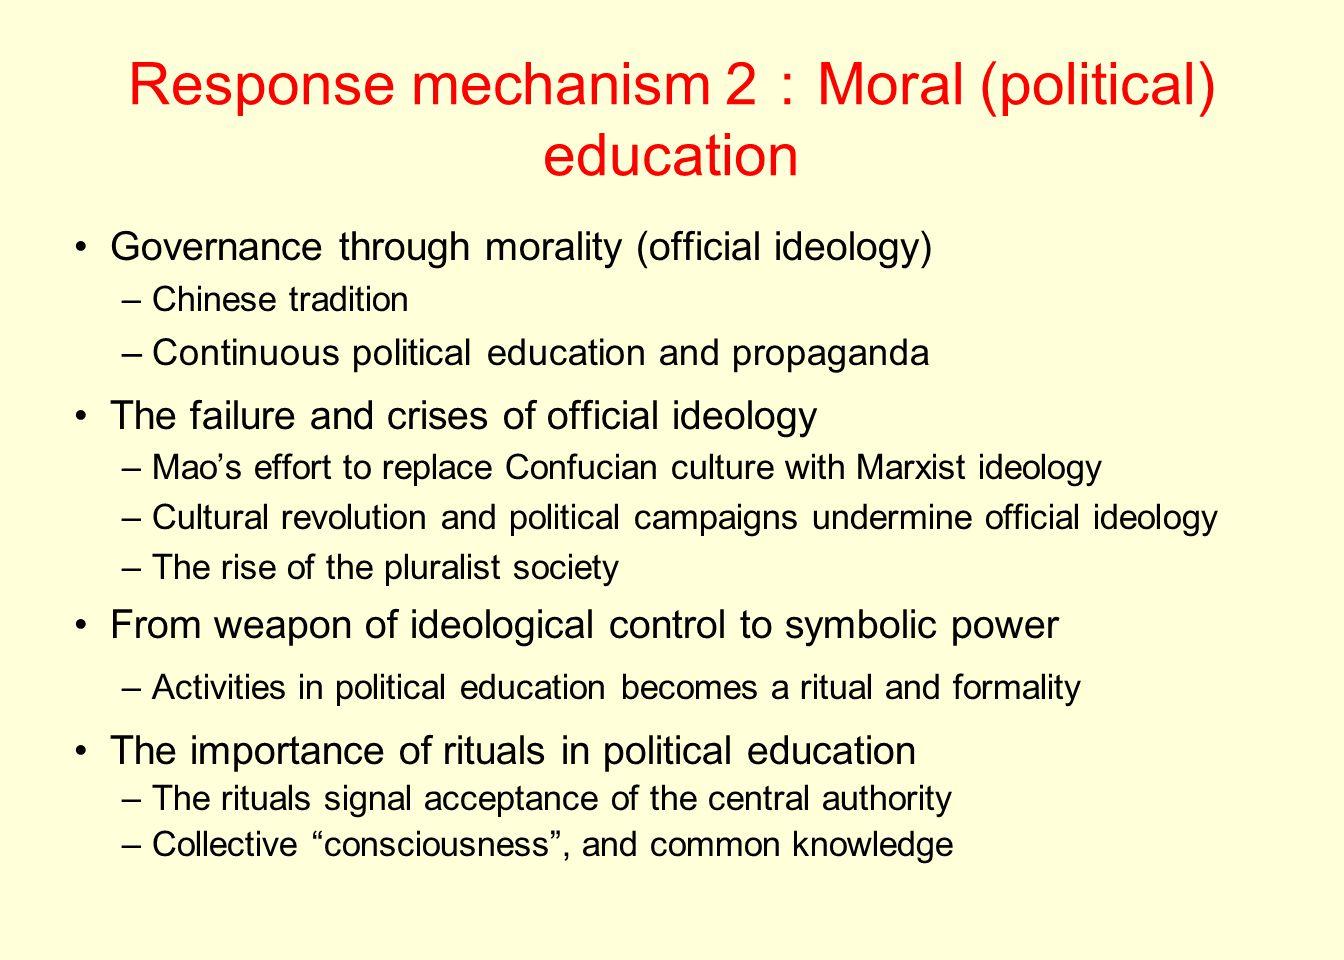 Response mechanism 2:Moral (political) education